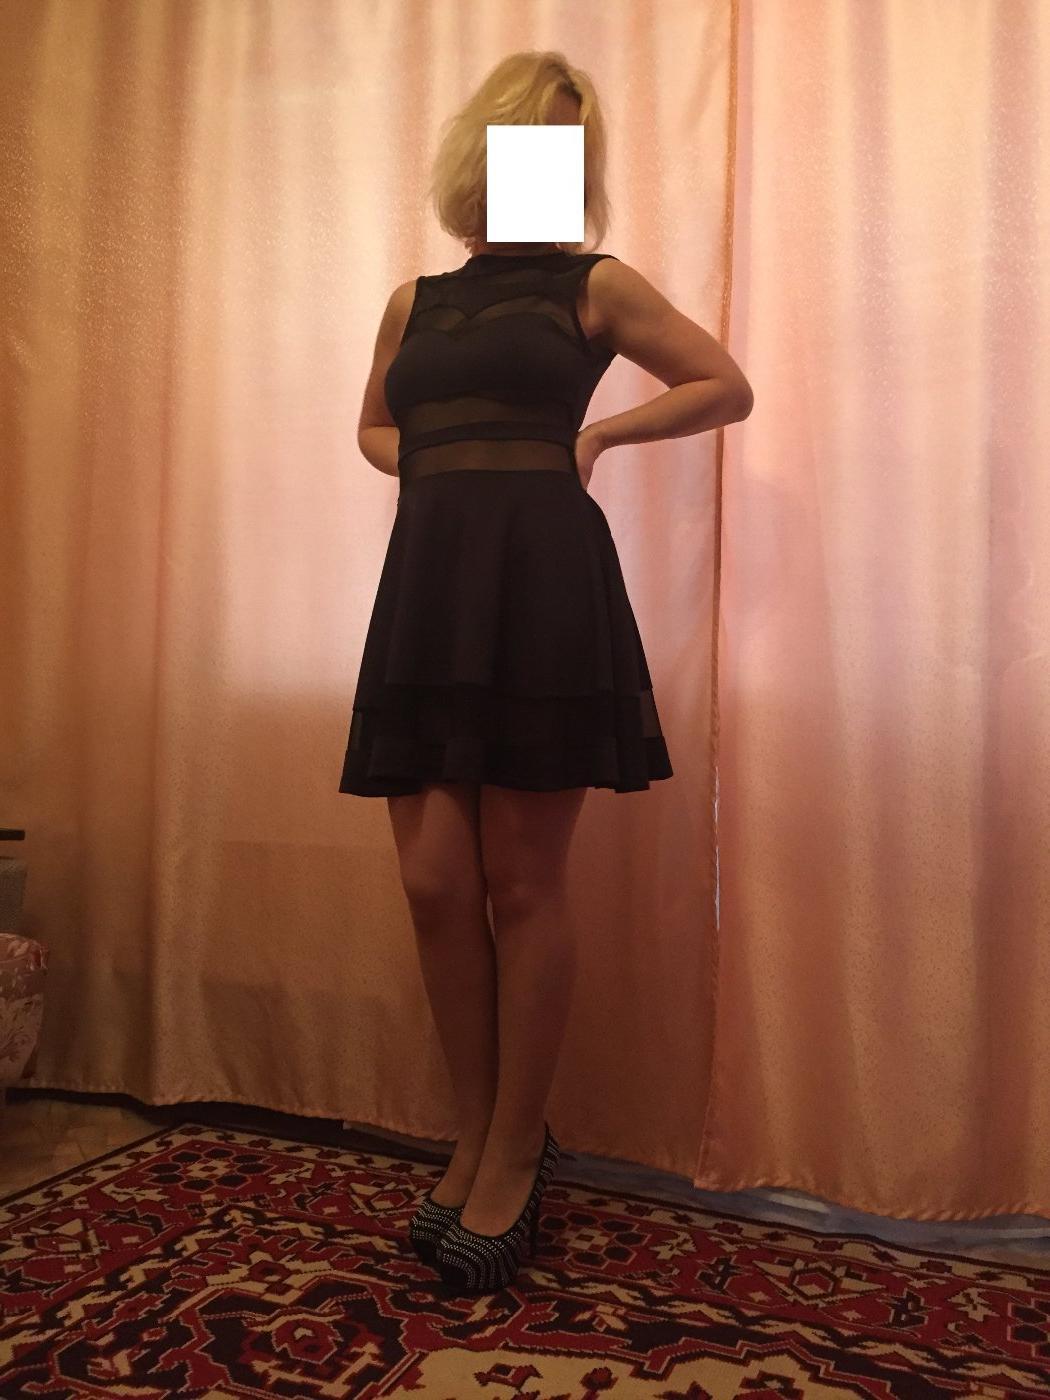 Проститутка Эмилия, 33 года, метро Плющиха